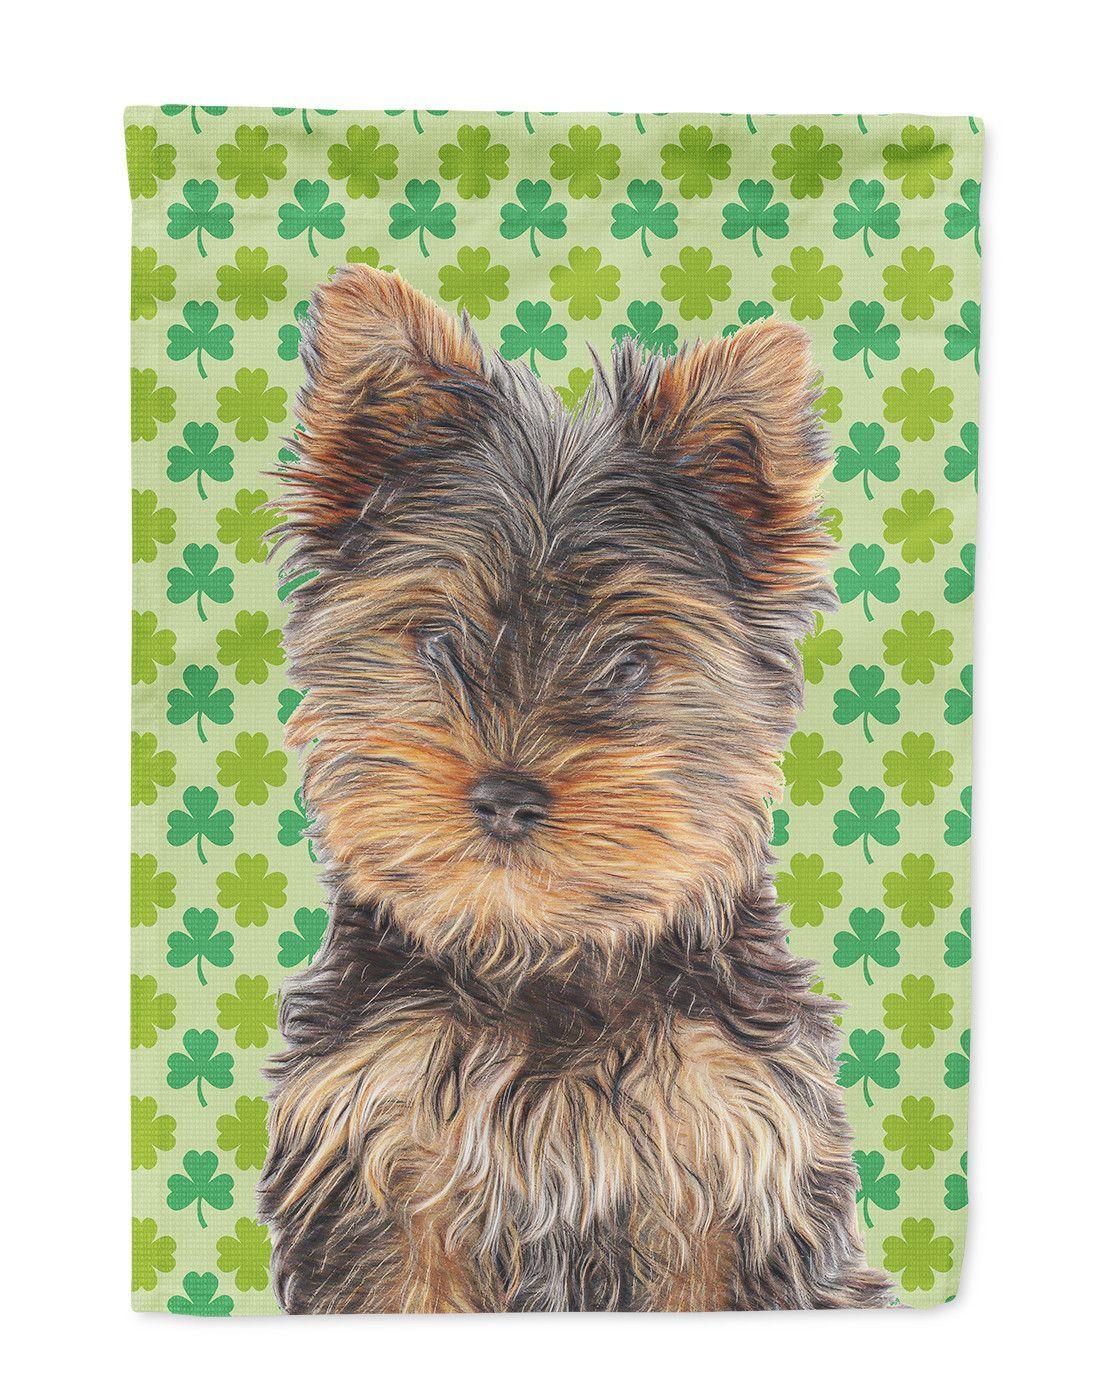 St. Patricku0027s Day Shamrock Yorkie Puppy / Yorkshire Terrier Flag Garden  Size KJ1202GF